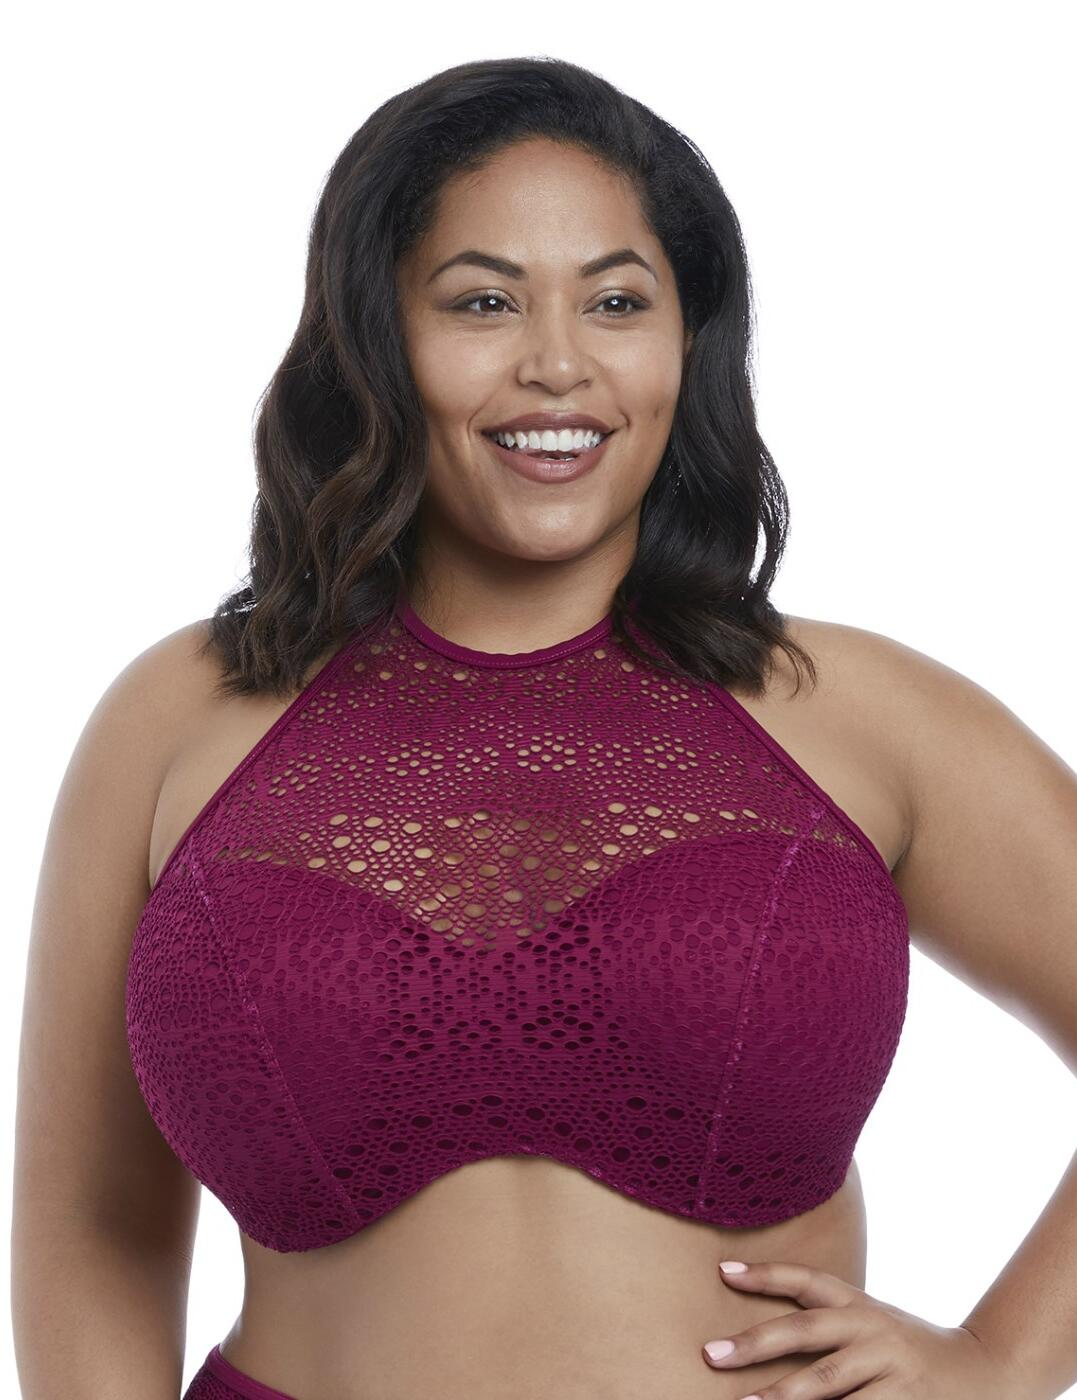 7537 Elomi Indie Underwired Bandeau High Neck Bikini Top - 7537 Berry